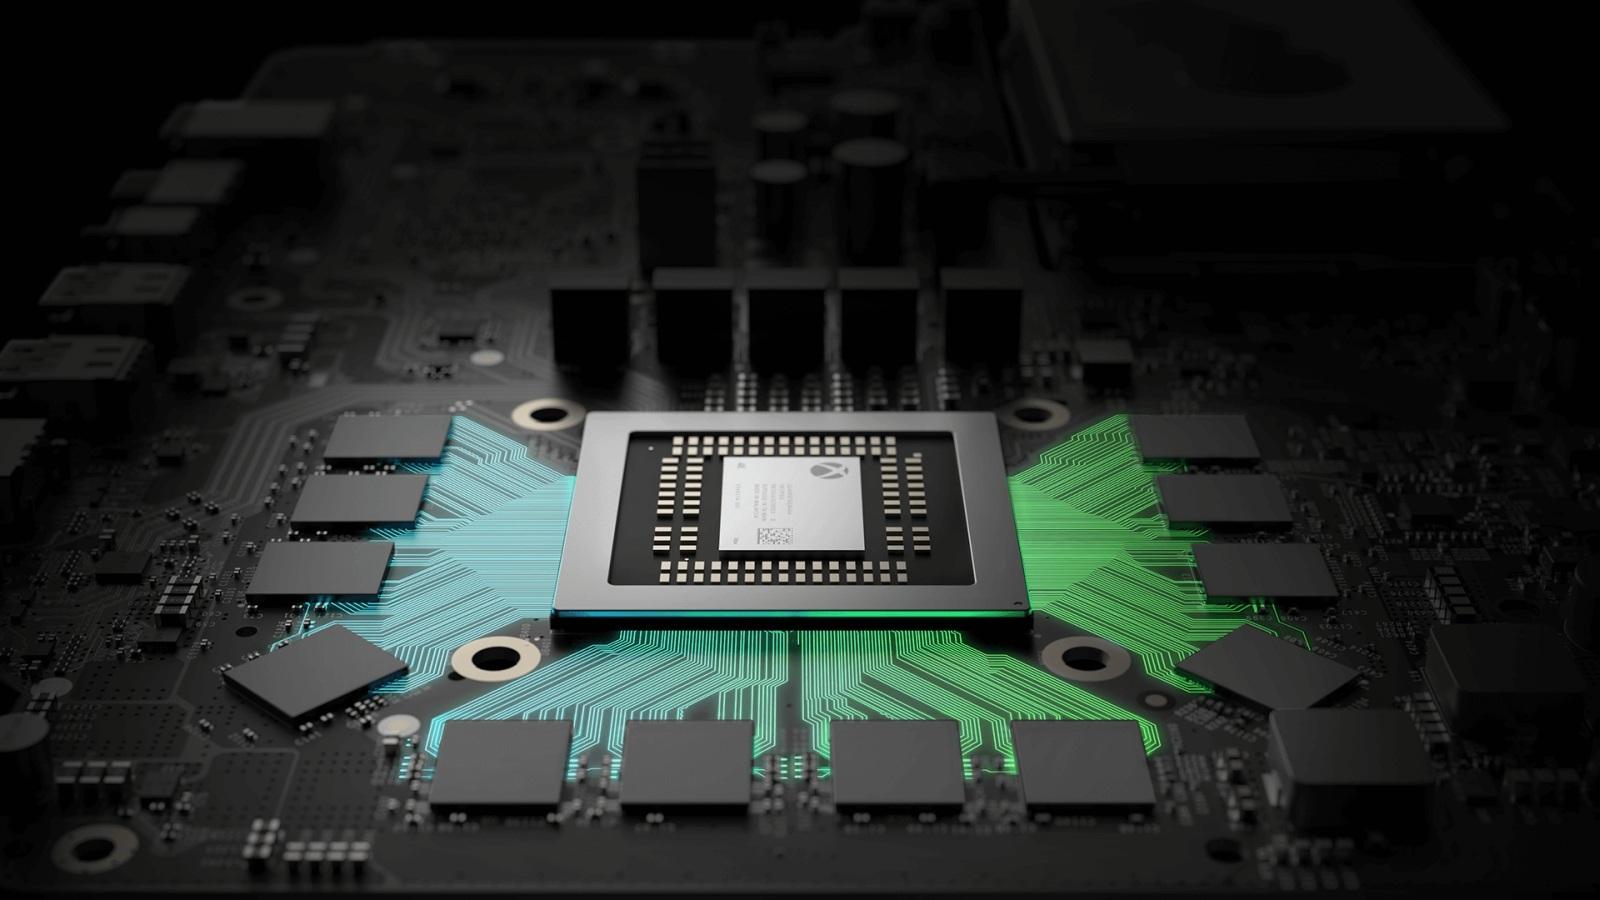 Xbox One S All-Digital Edition; screenshot: CPU